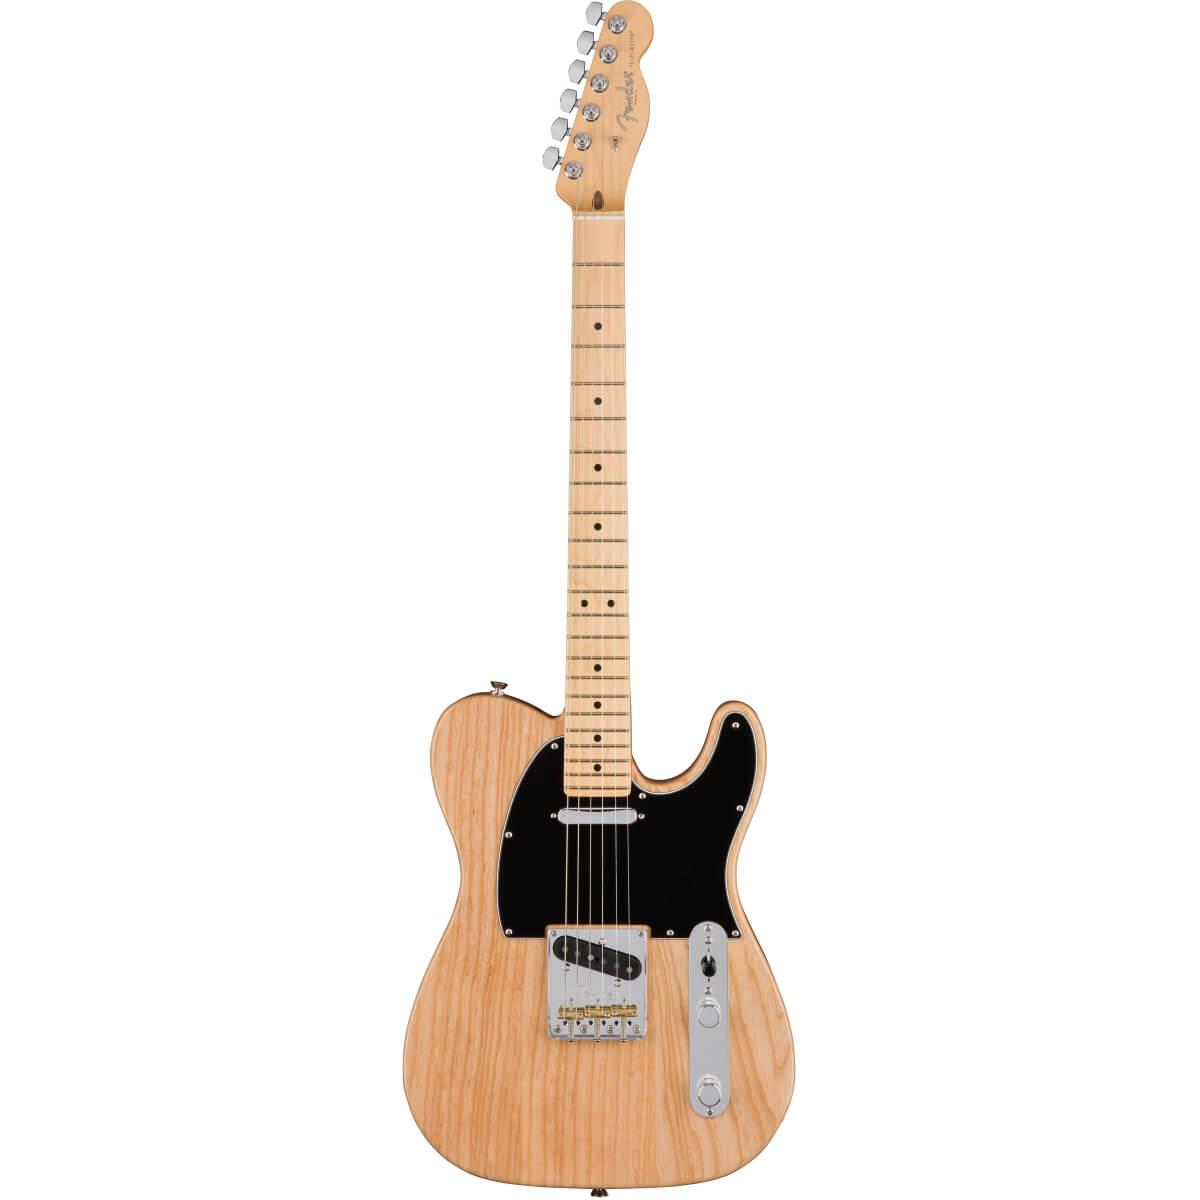 Fender AmericanProTelecaster,MN,NAT el-guitar natur